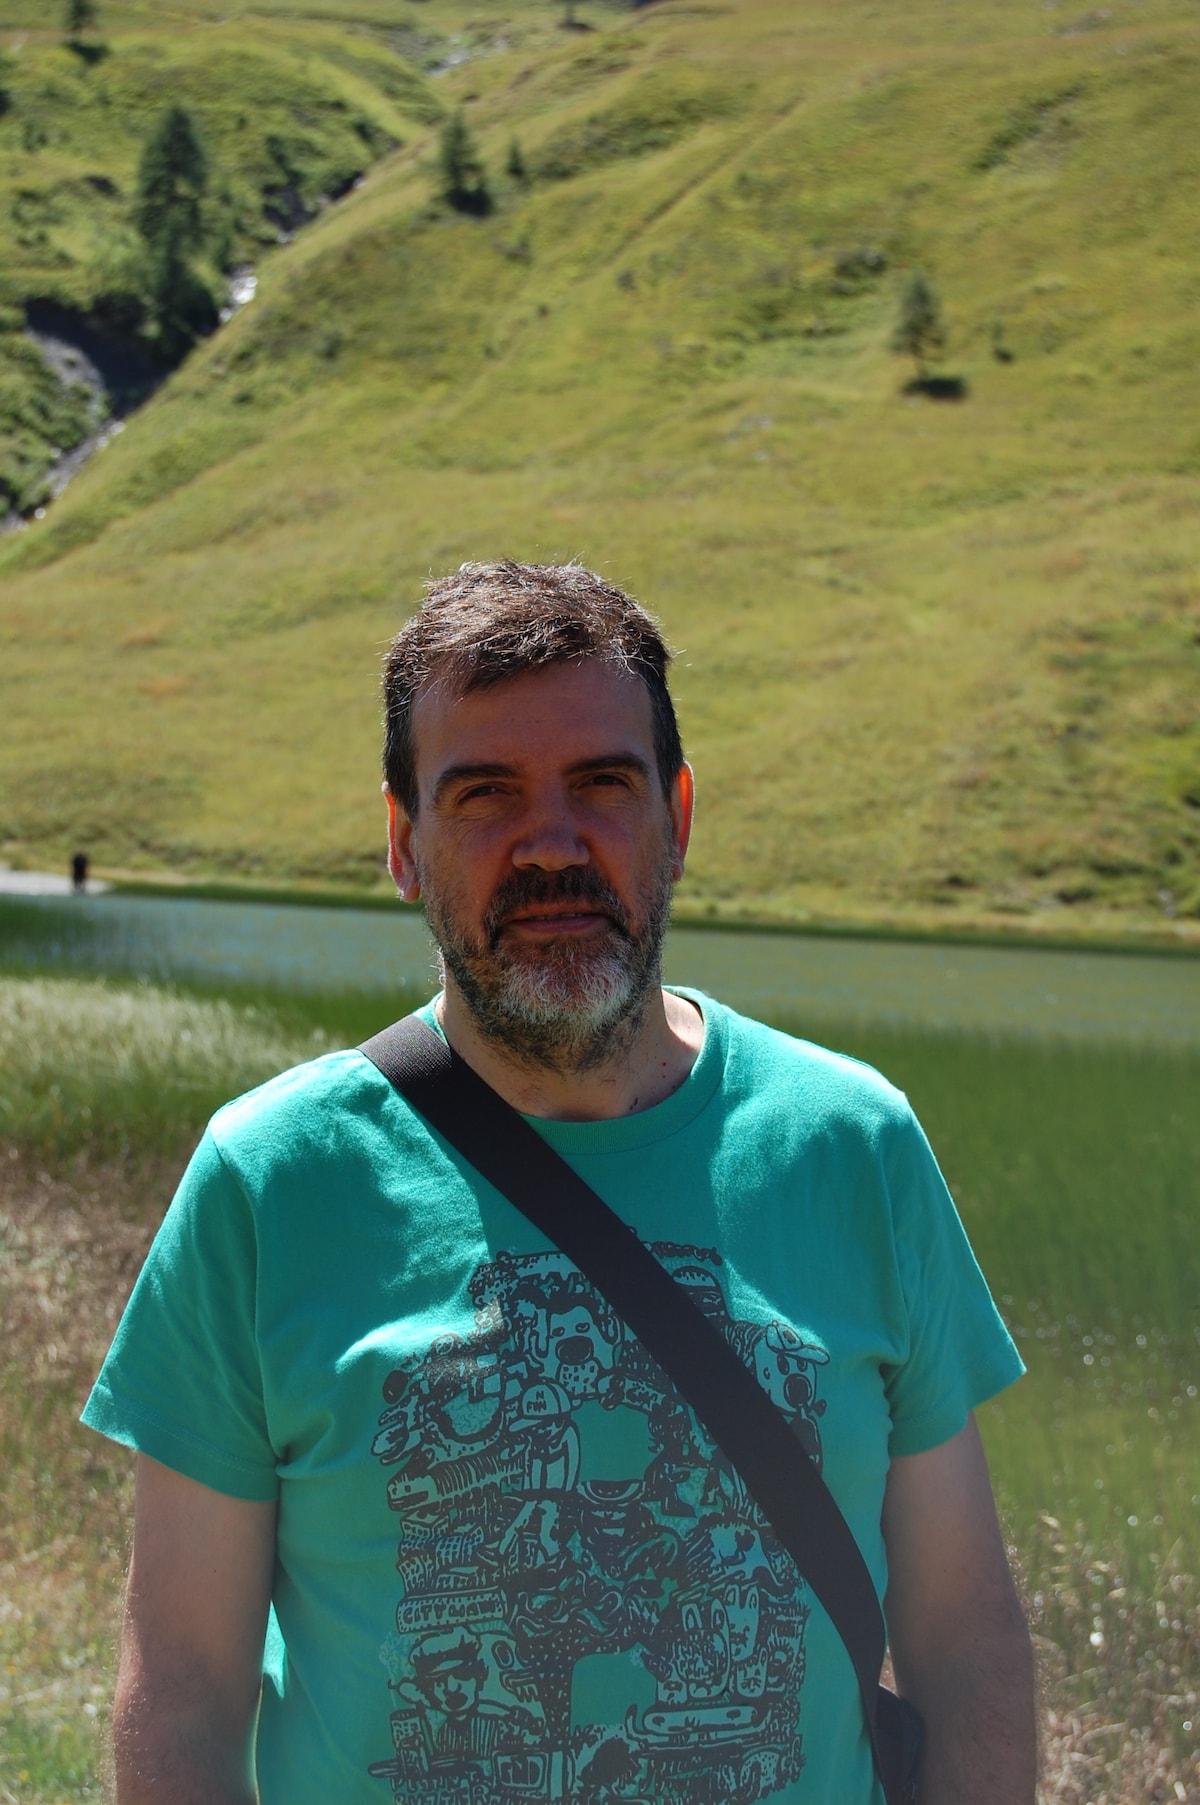 Luis from Veliko Tarnovo